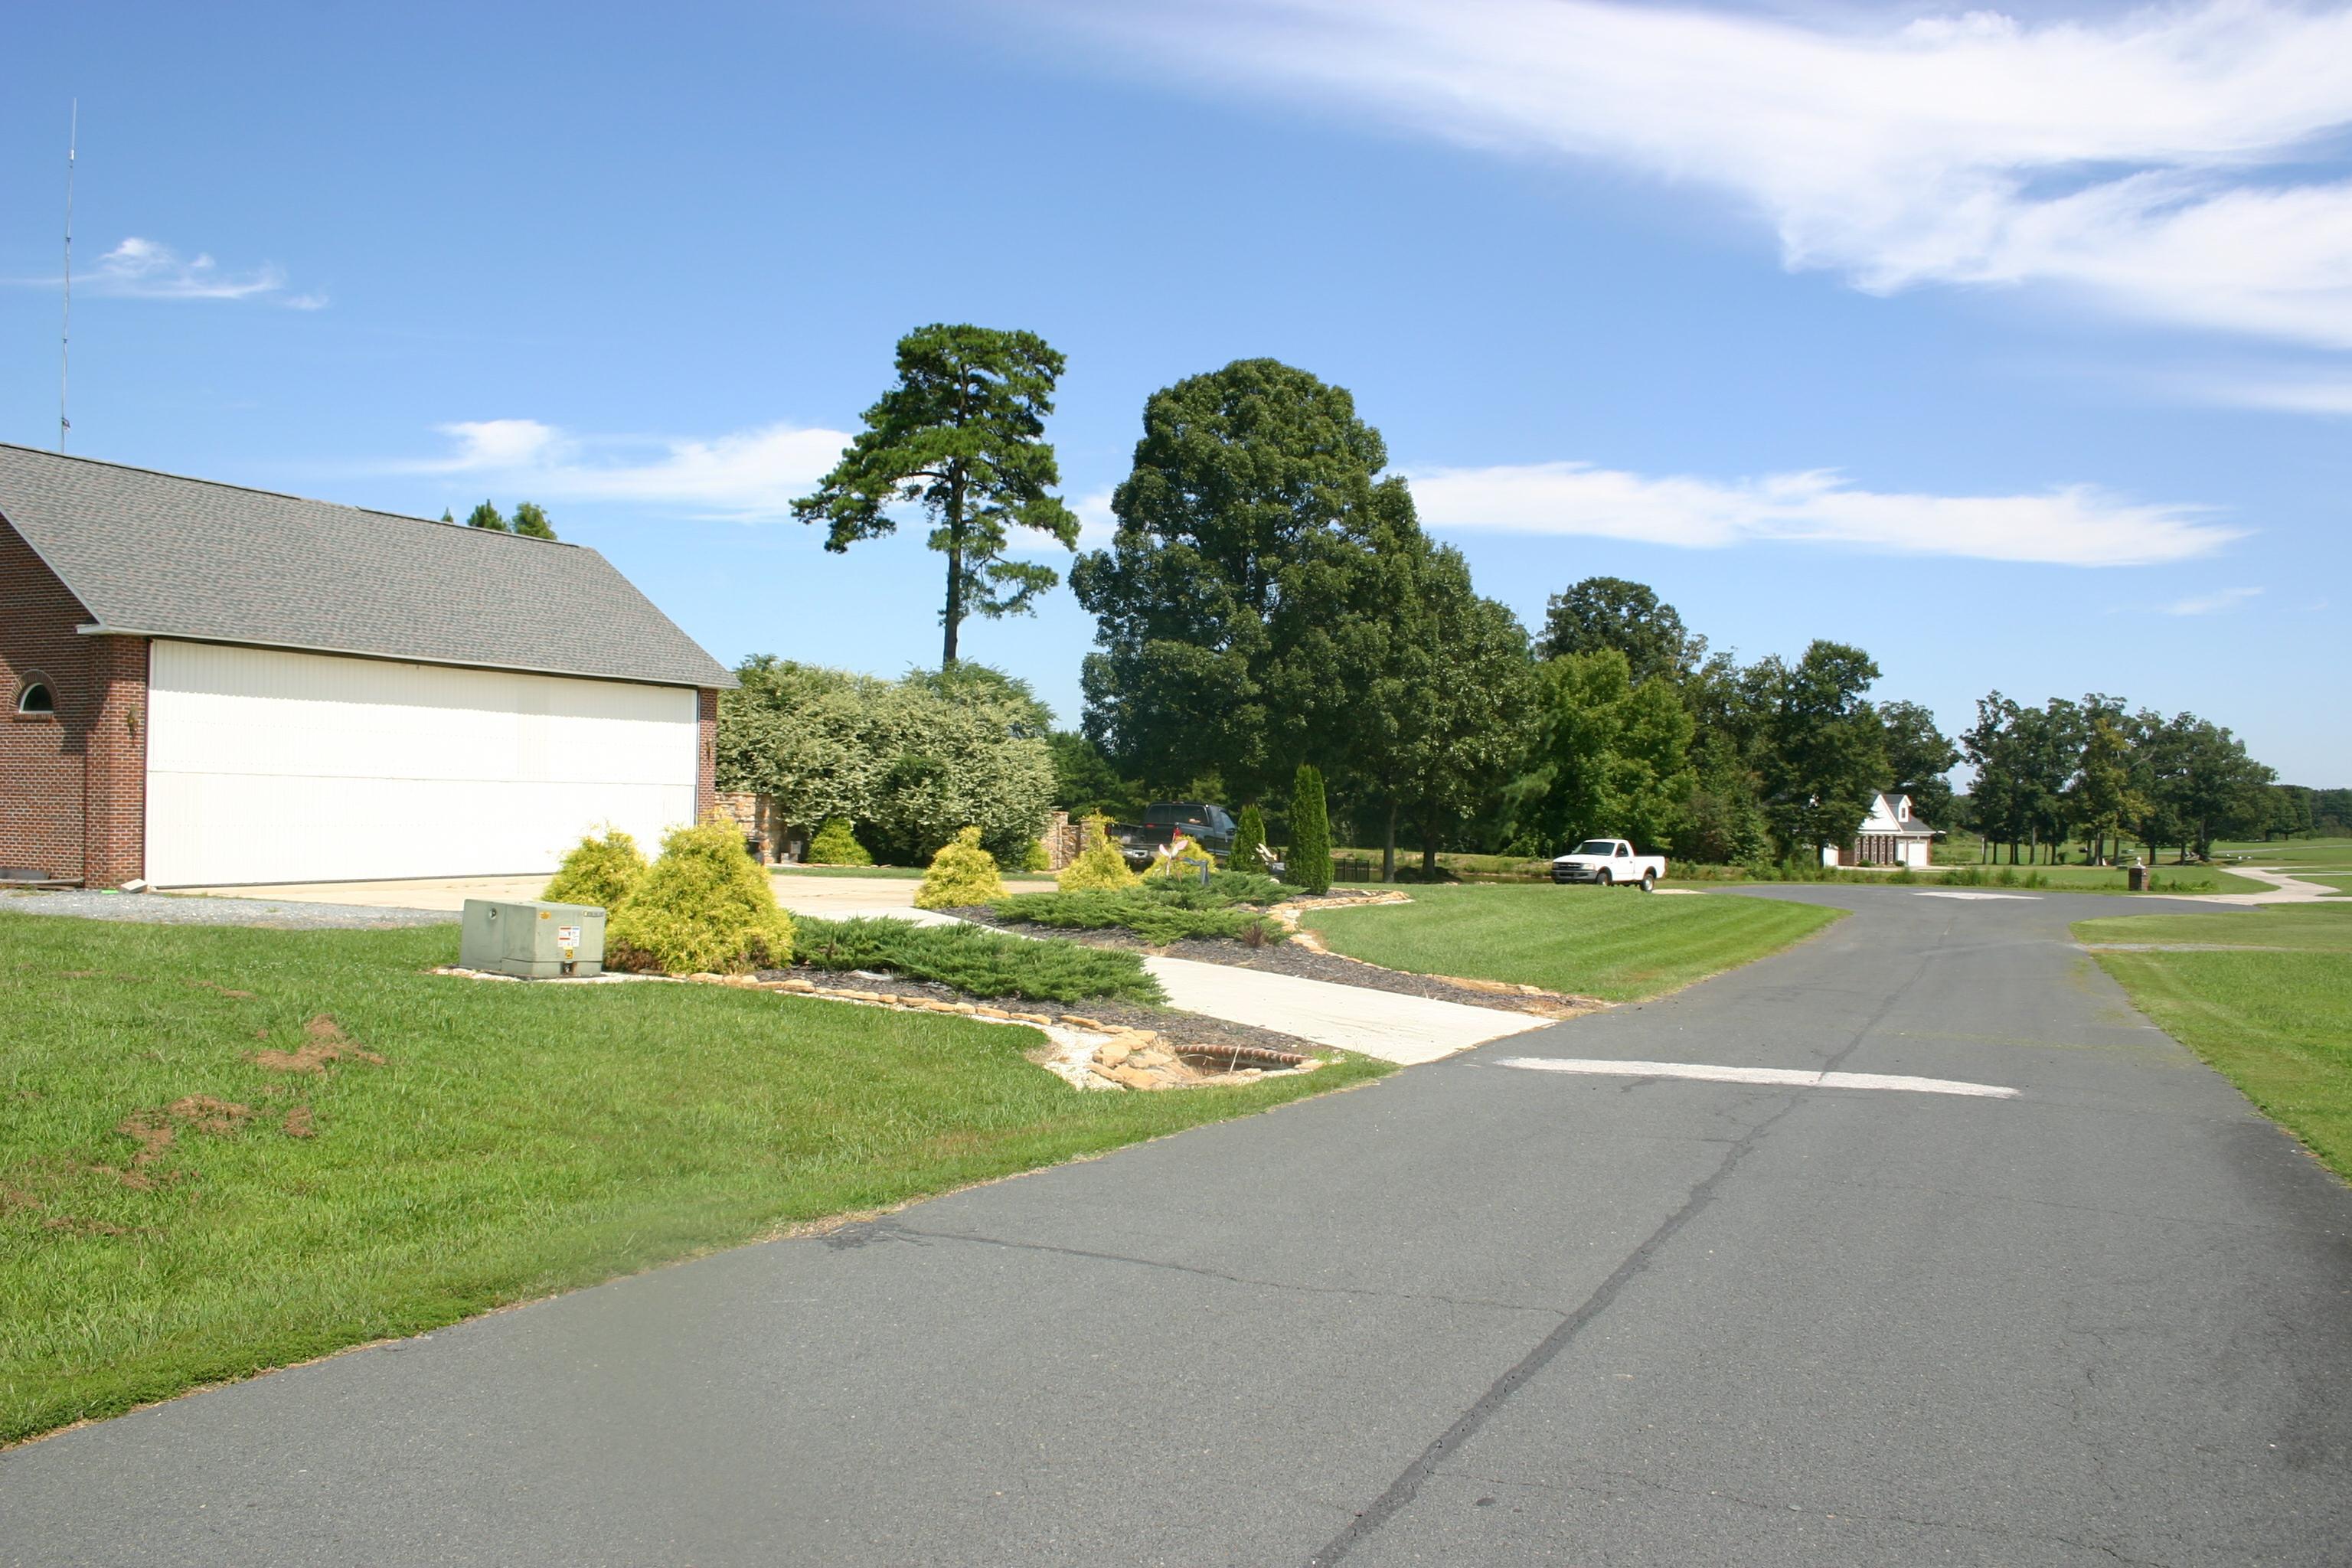 North Carolina Restrictive Covenants Build New Home